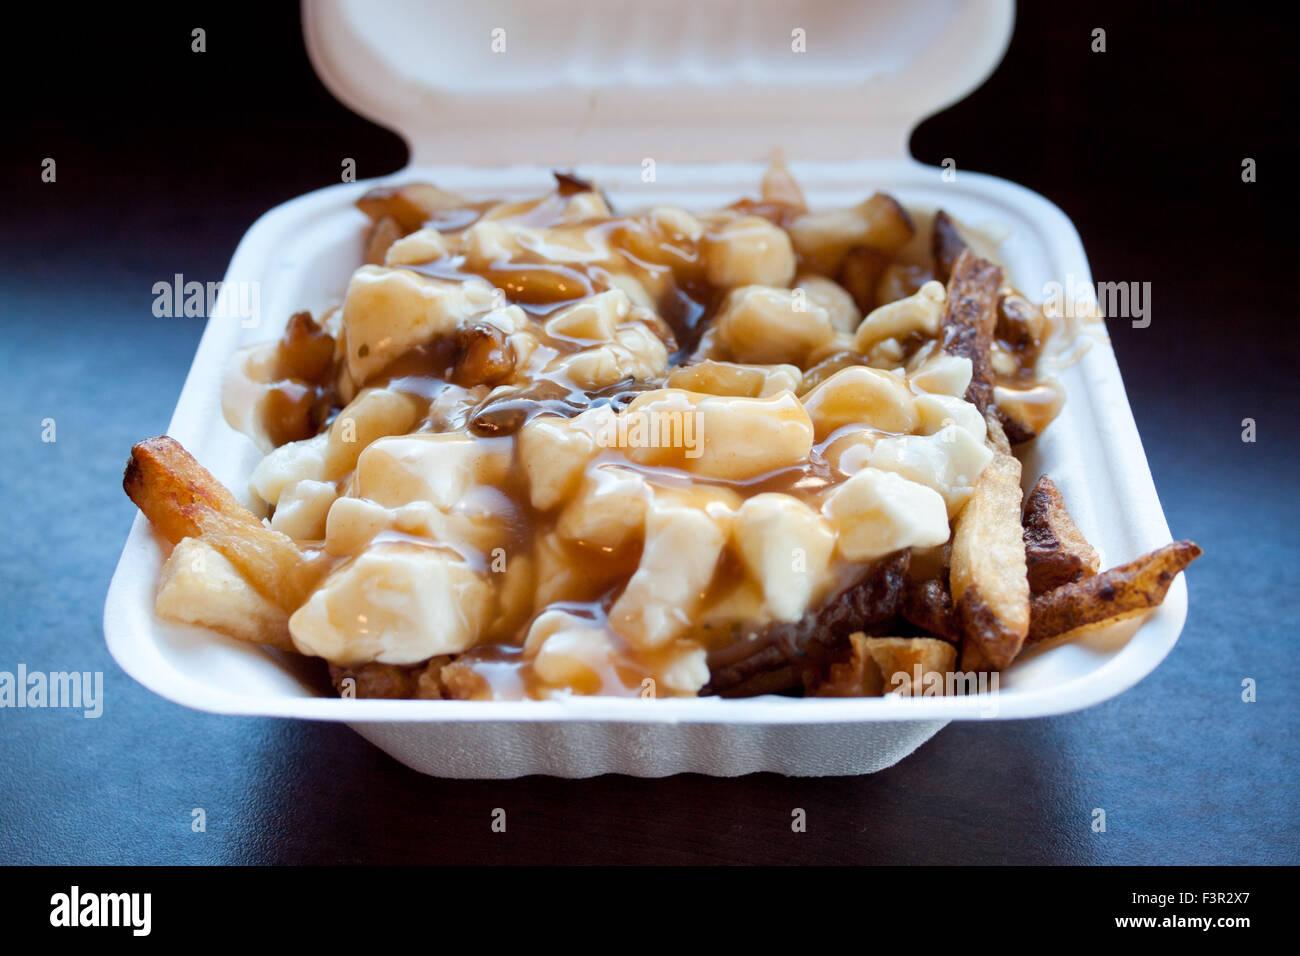 A takeout box of classic Quebec poutine from La Poutine in Edmonton, Alberta, Canada. - Stock Image